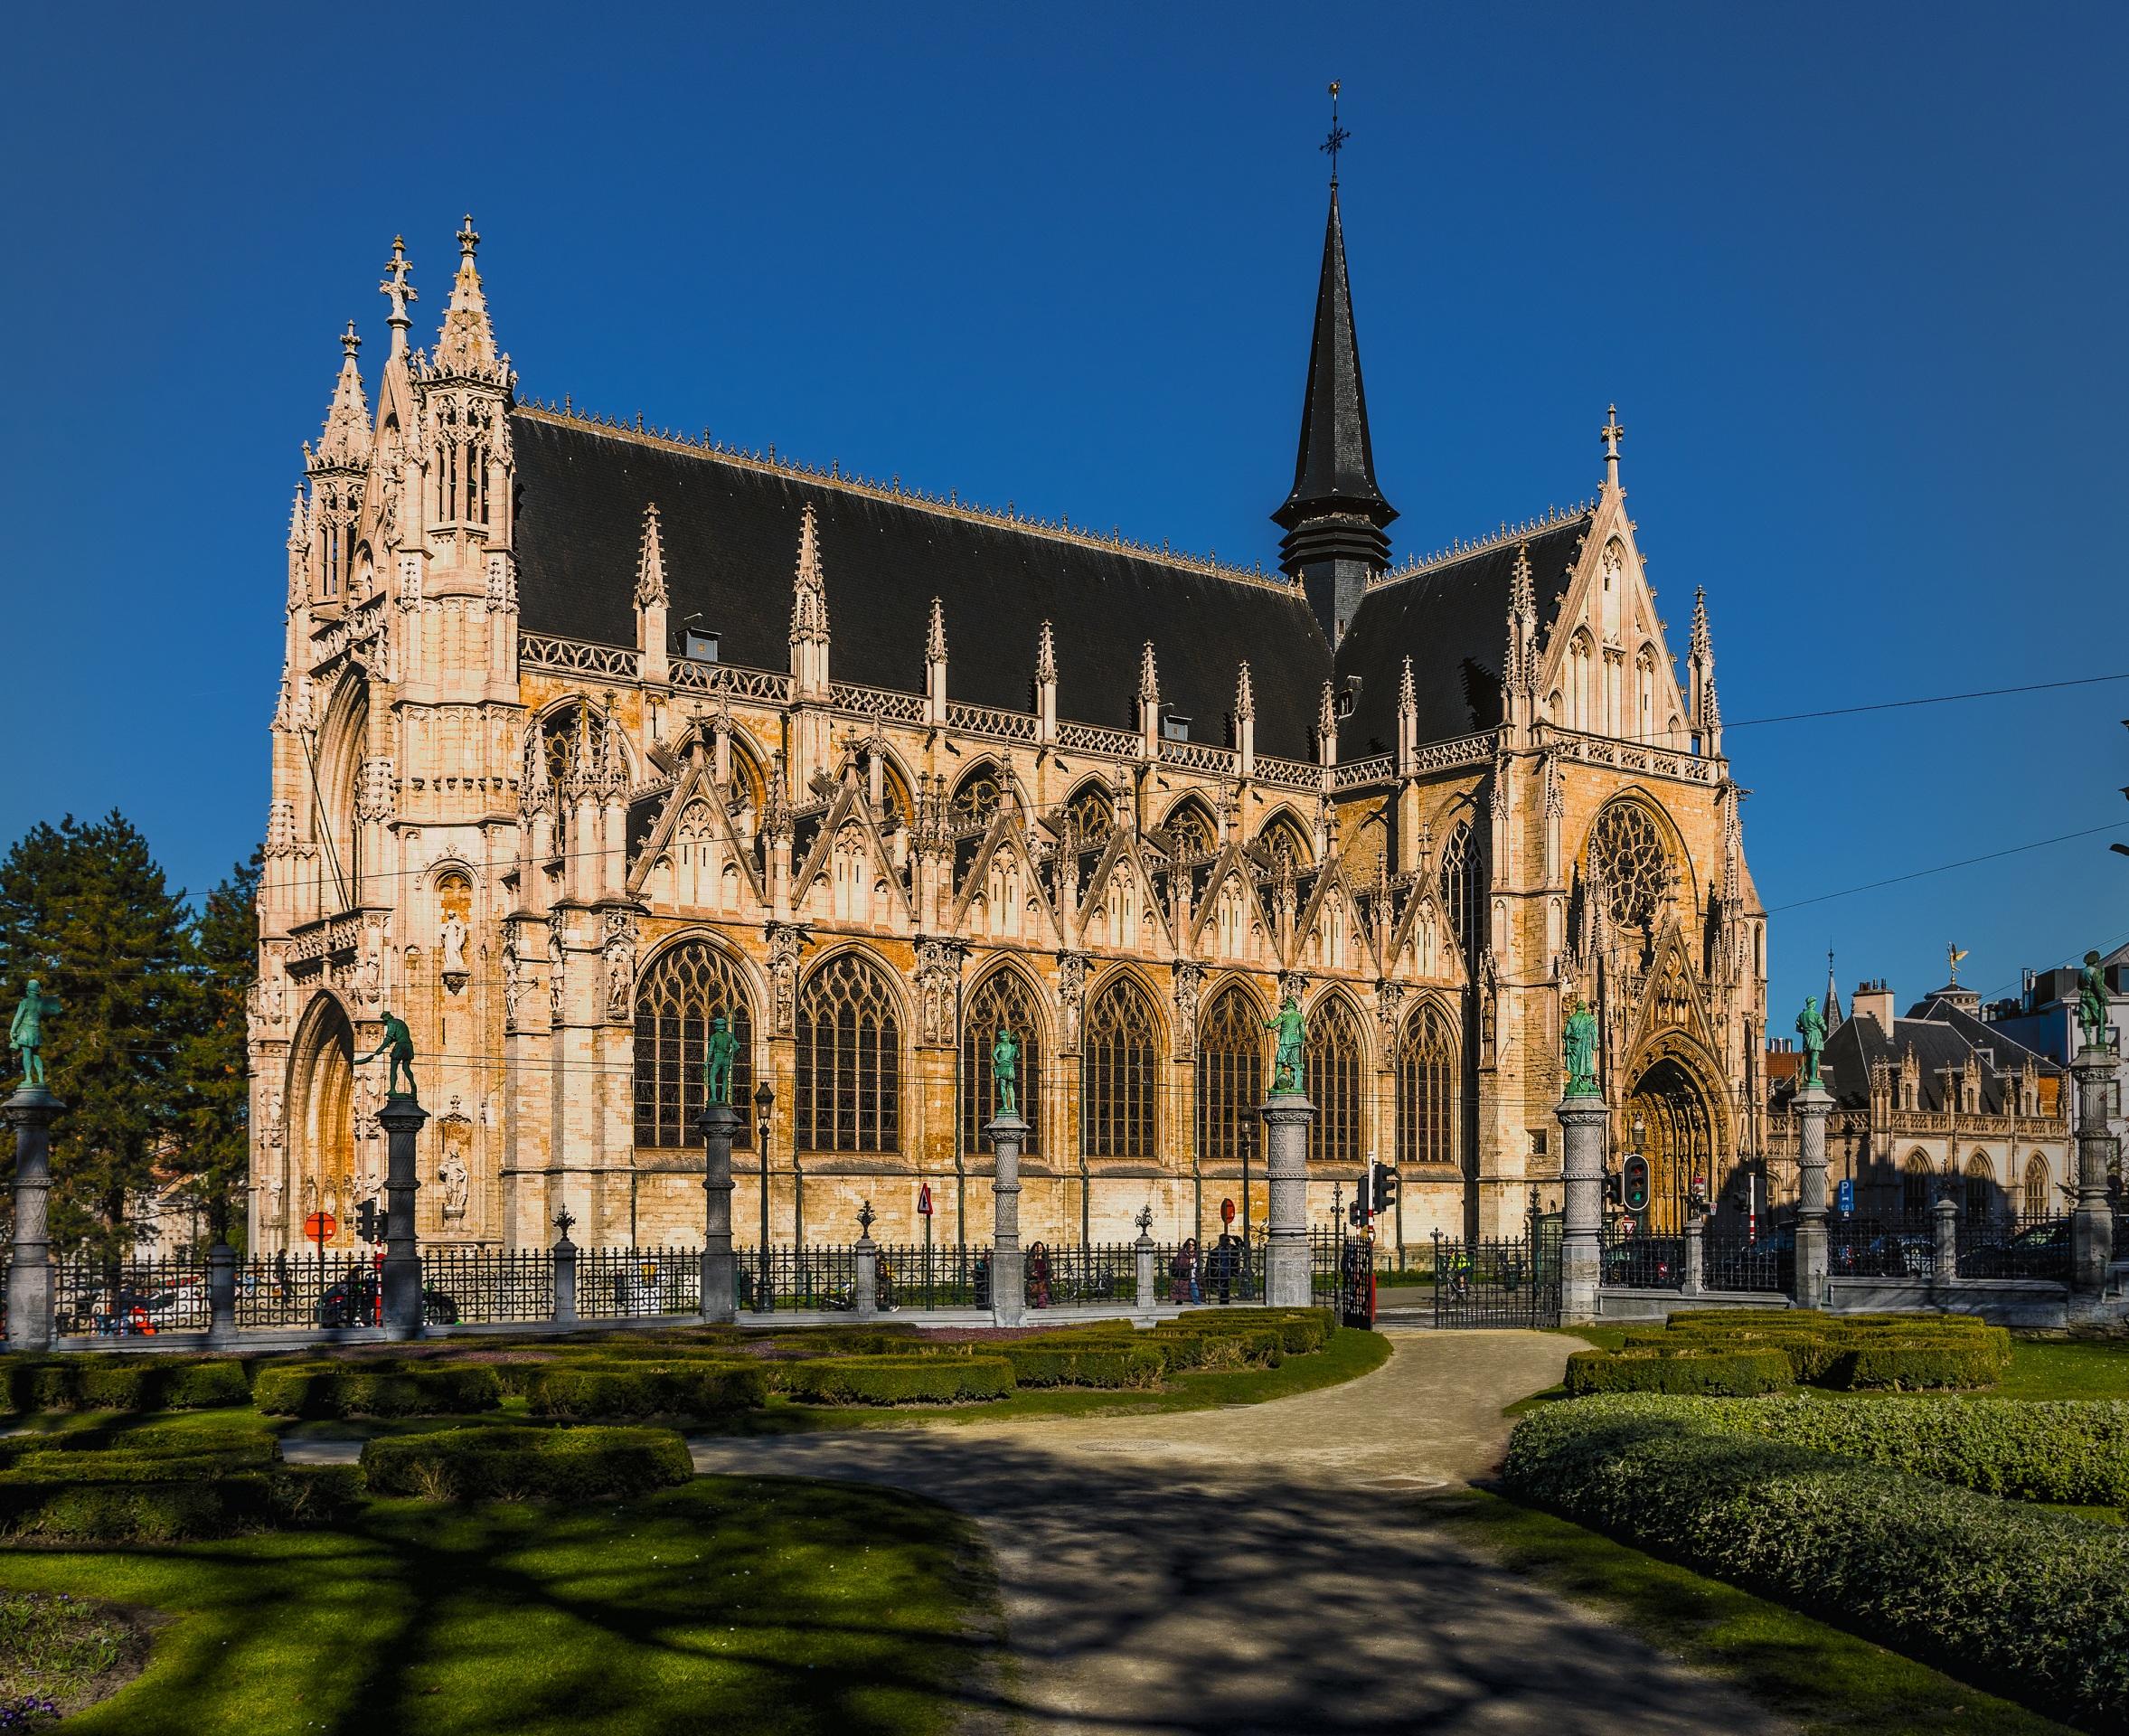 Фото Церковь Бельгия Brussels храм Города 2355x1920 Храмы город